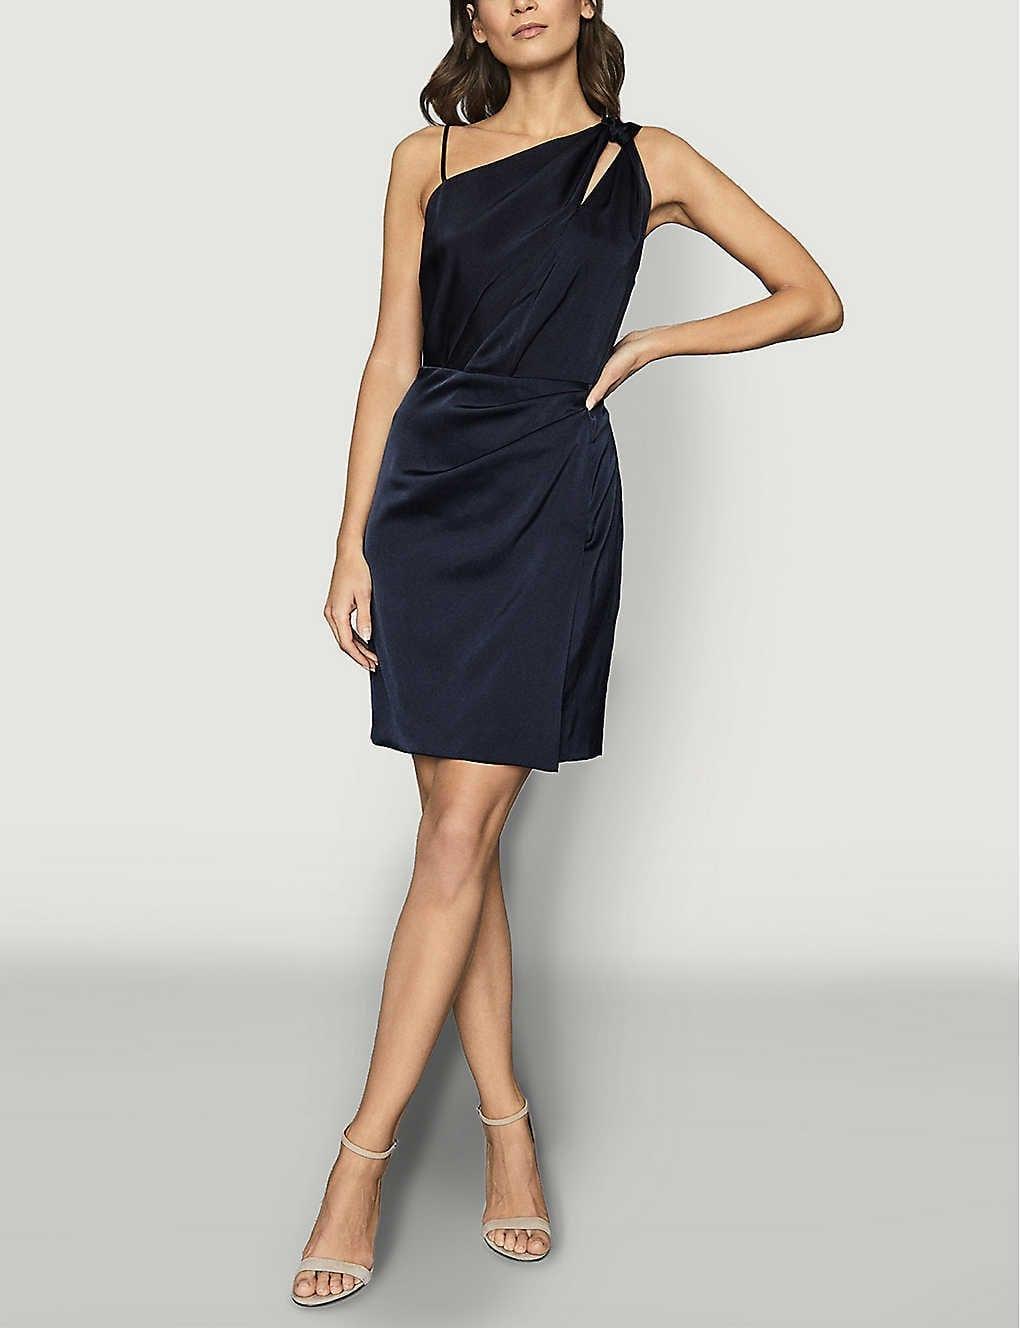 REISS Adara One Shoulder Satin Midi Dress